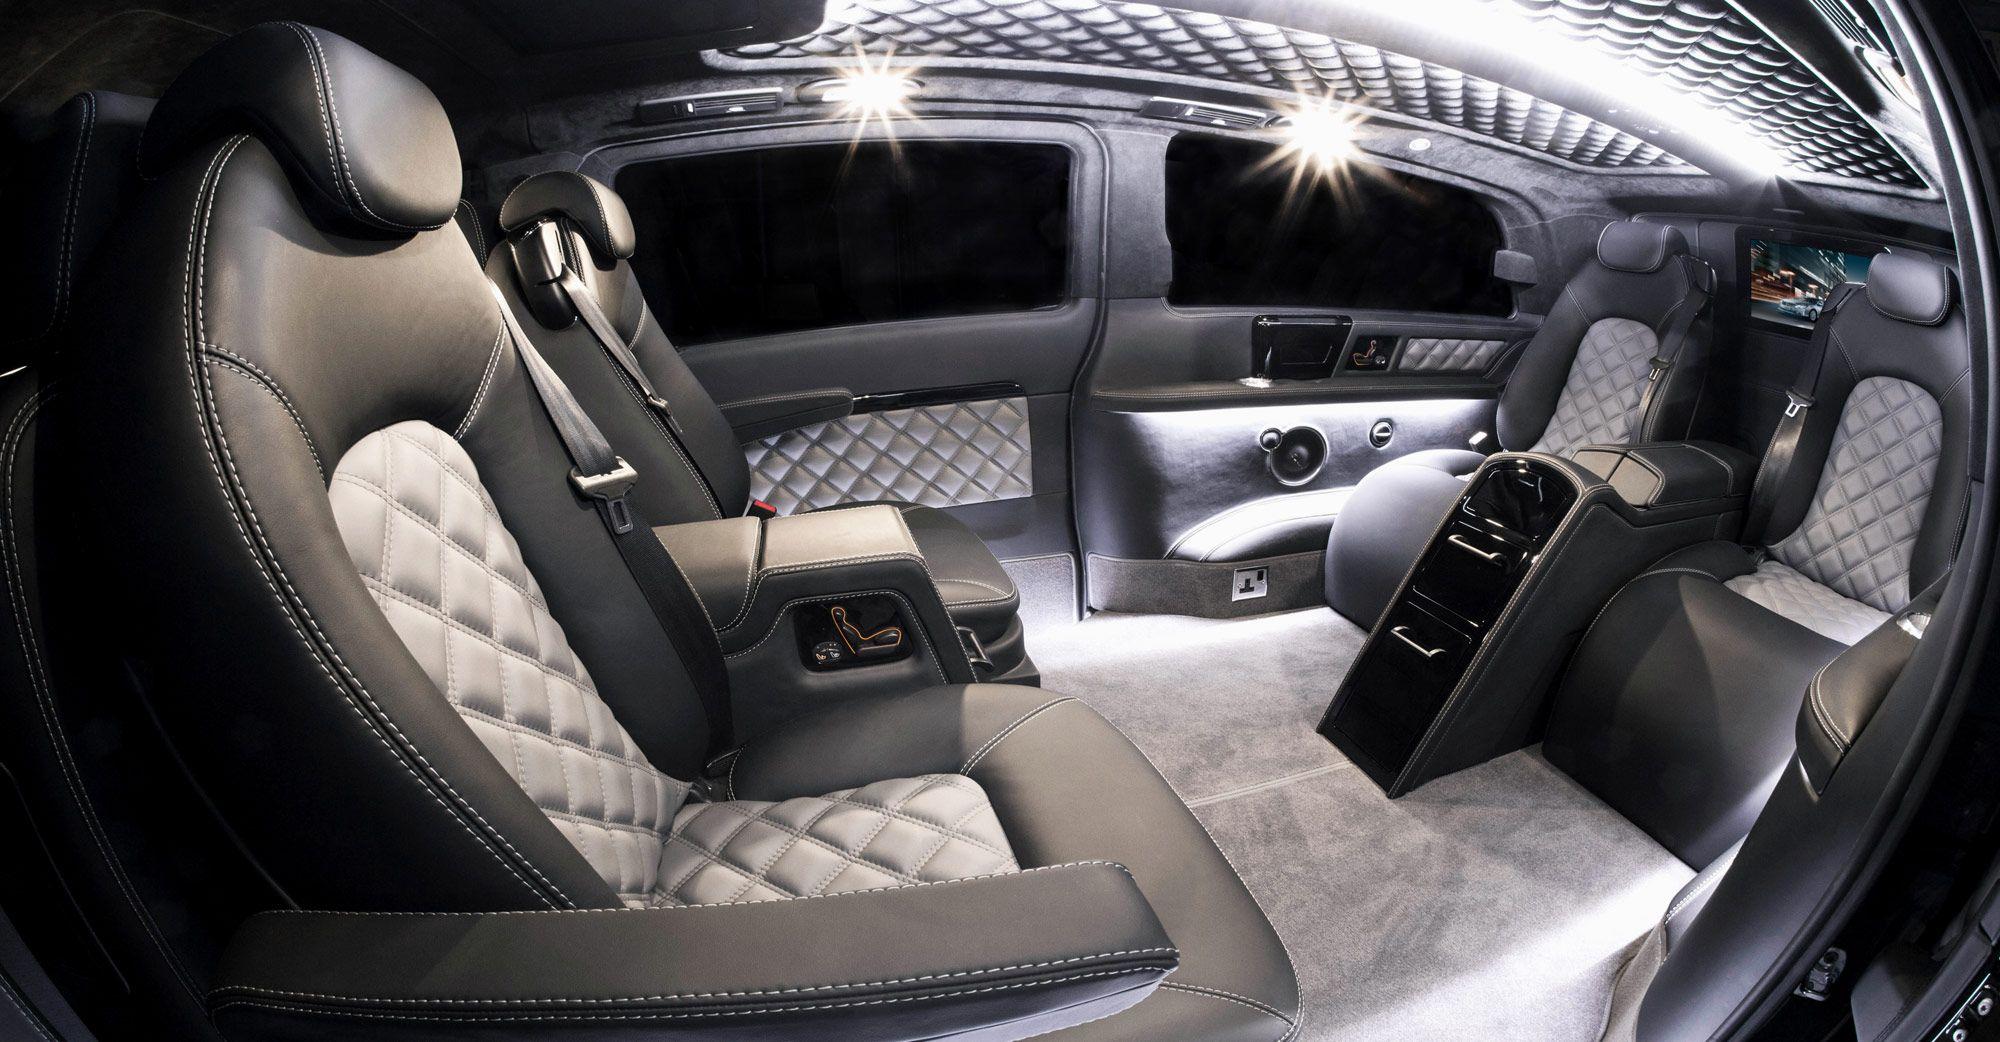 Mercedes Executive Google Search CARS Pinterest Cars